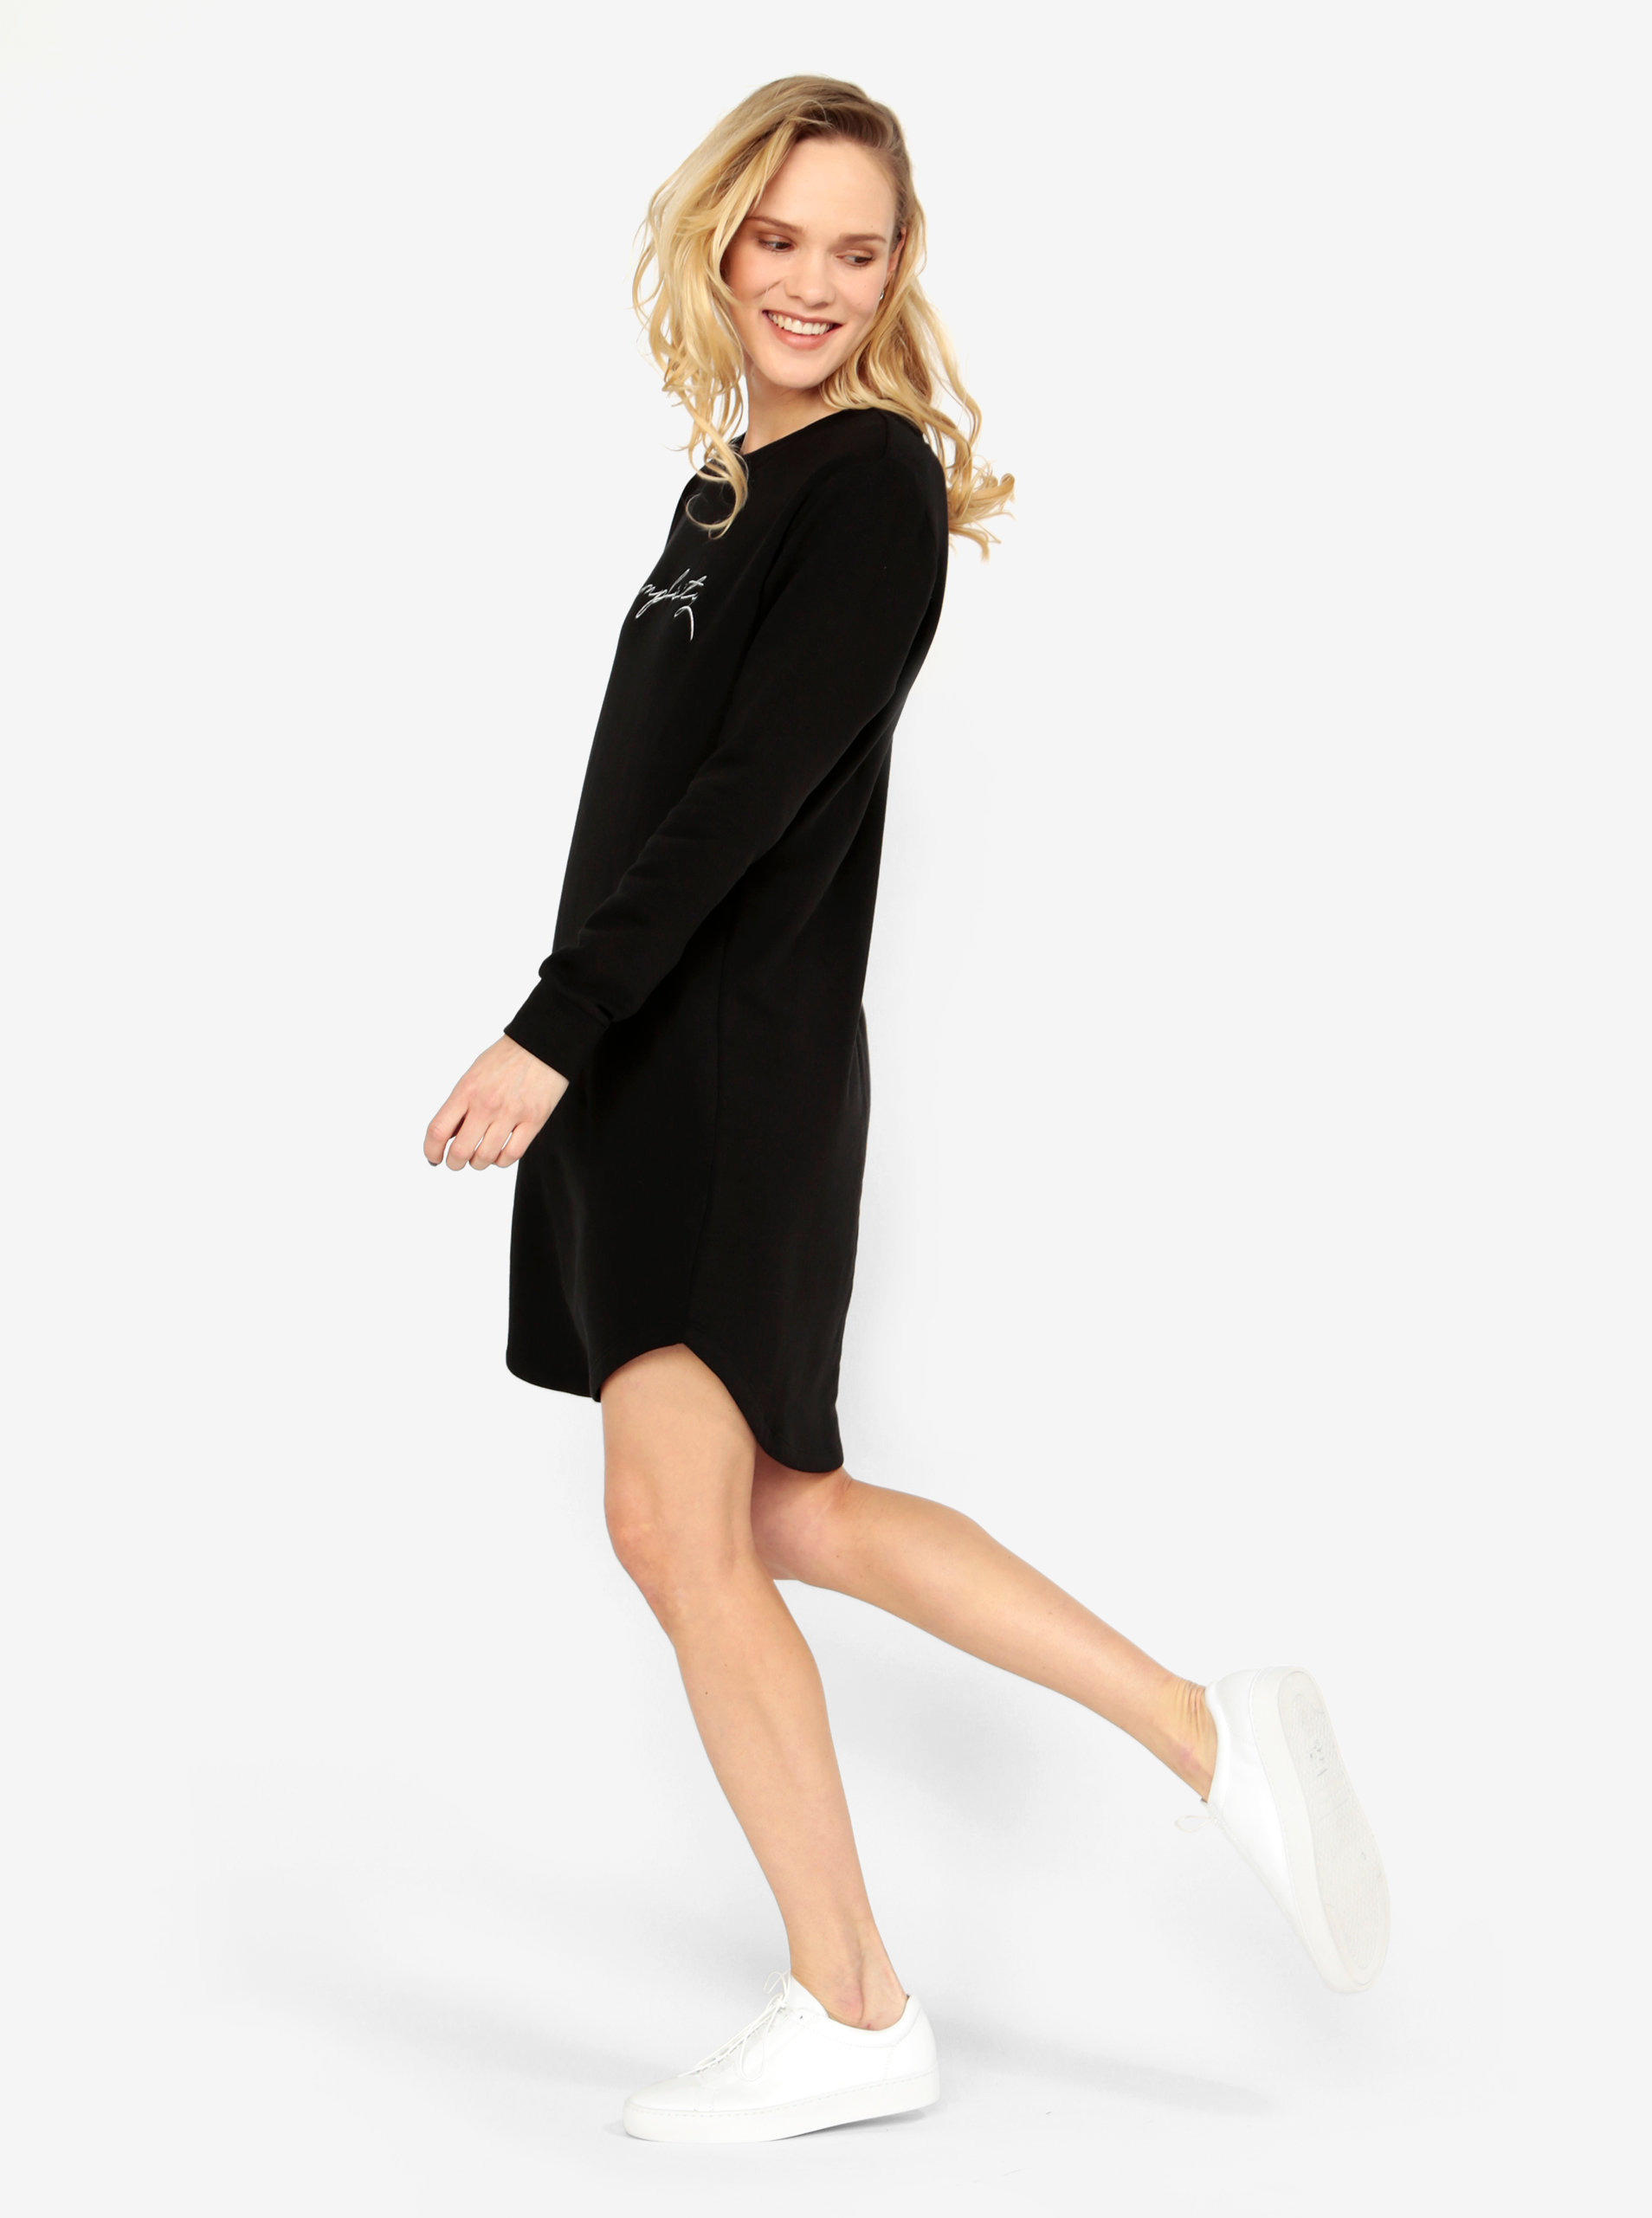 4c2caca6a828 Čierne mikinové šaty s dlhým rukávom Jacqueline de Yong Tori ...